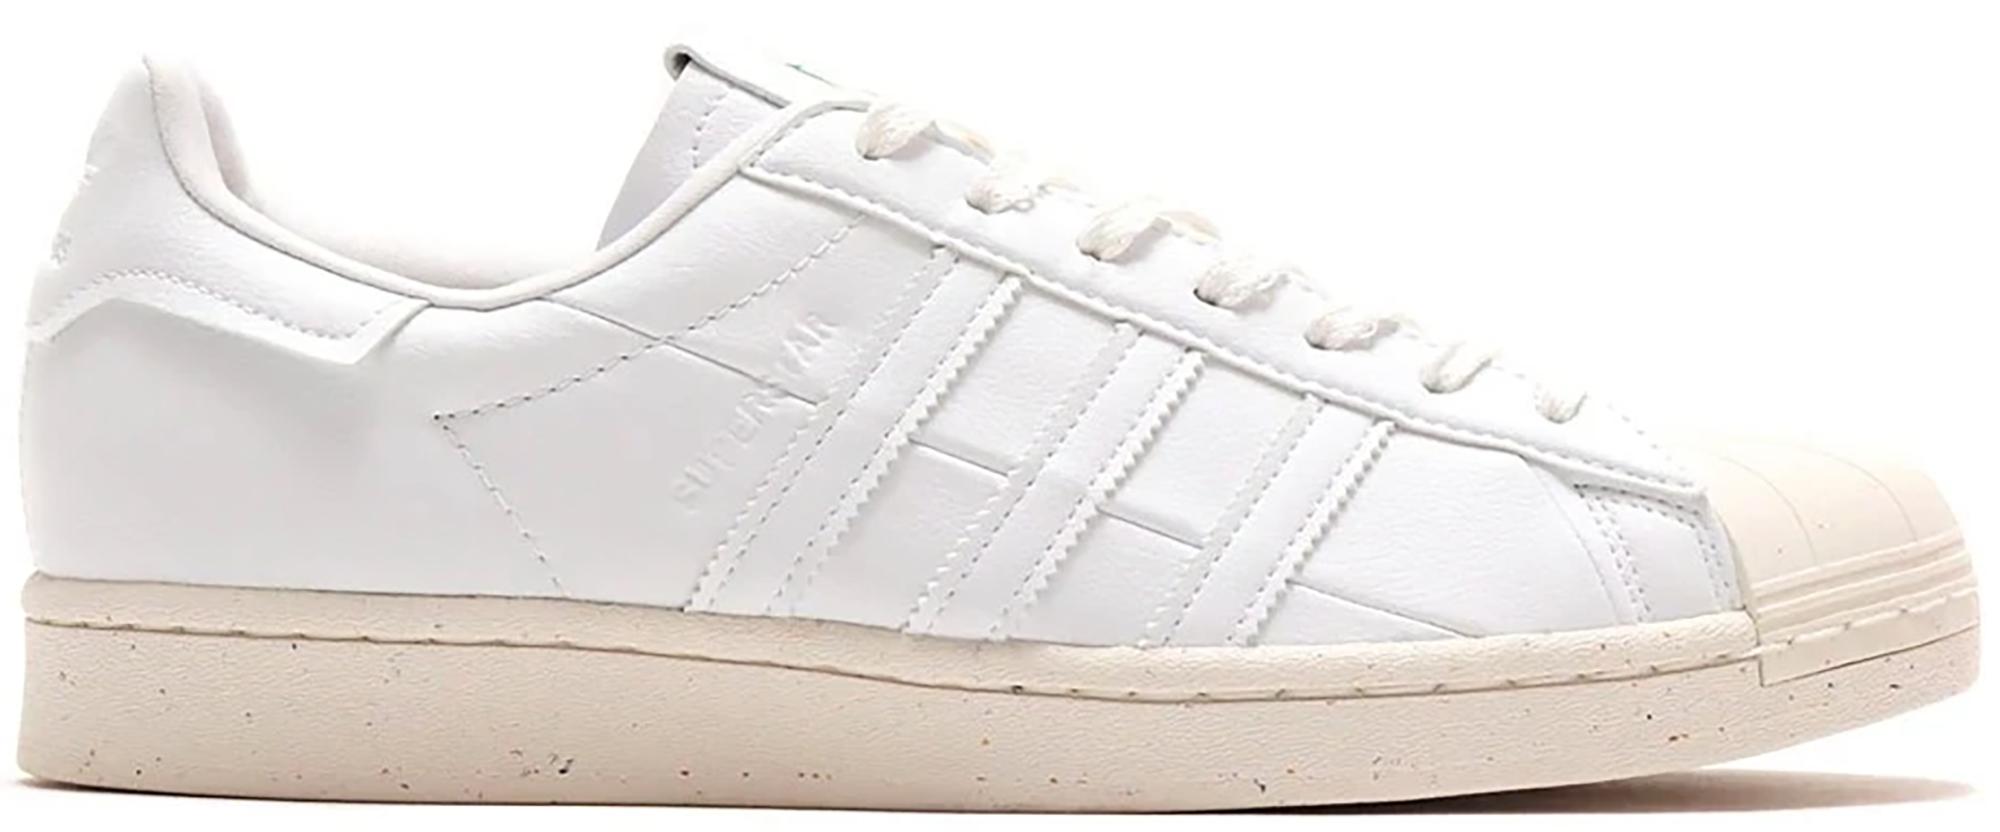 adidas Superstar Clean Classics White